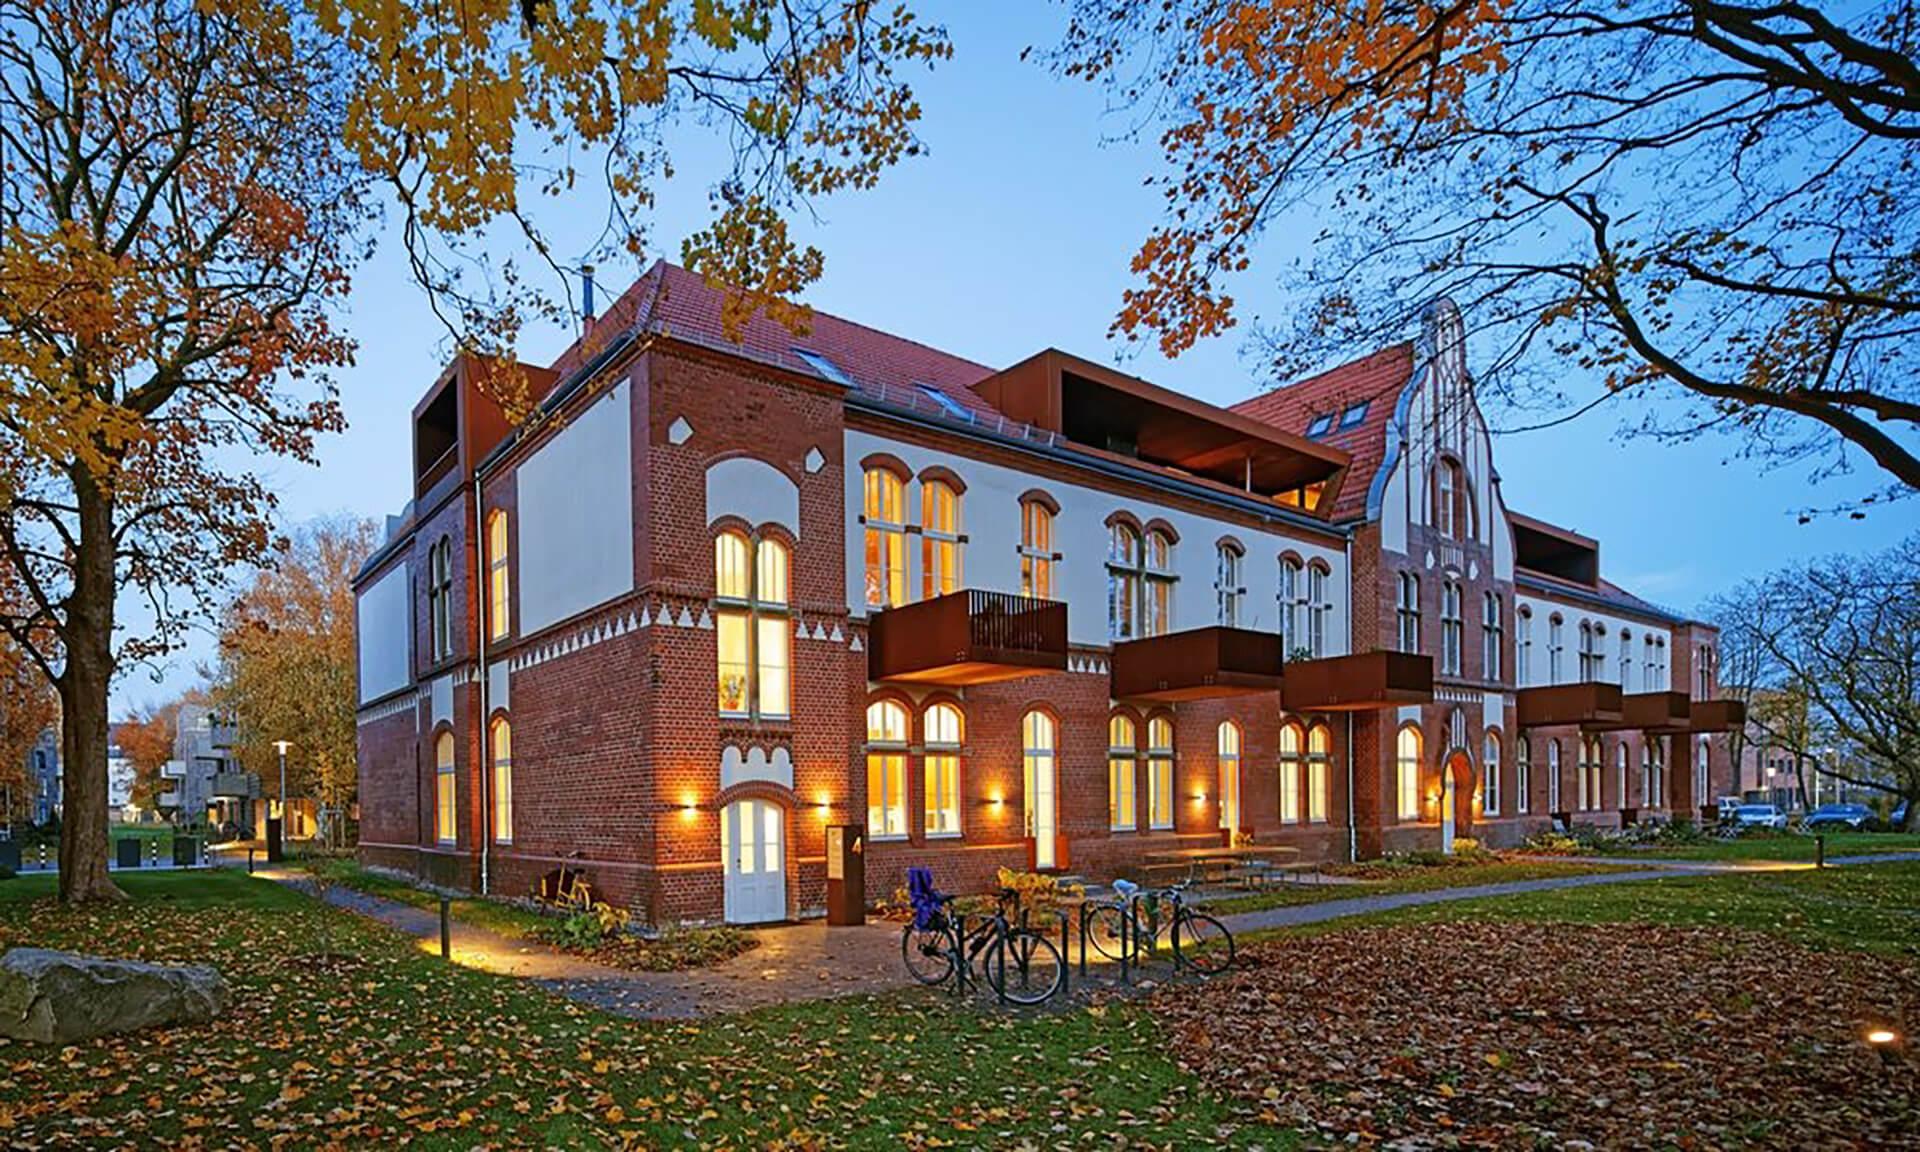 BP-IMG_6449-kl_BSP-Architekten-Kiel